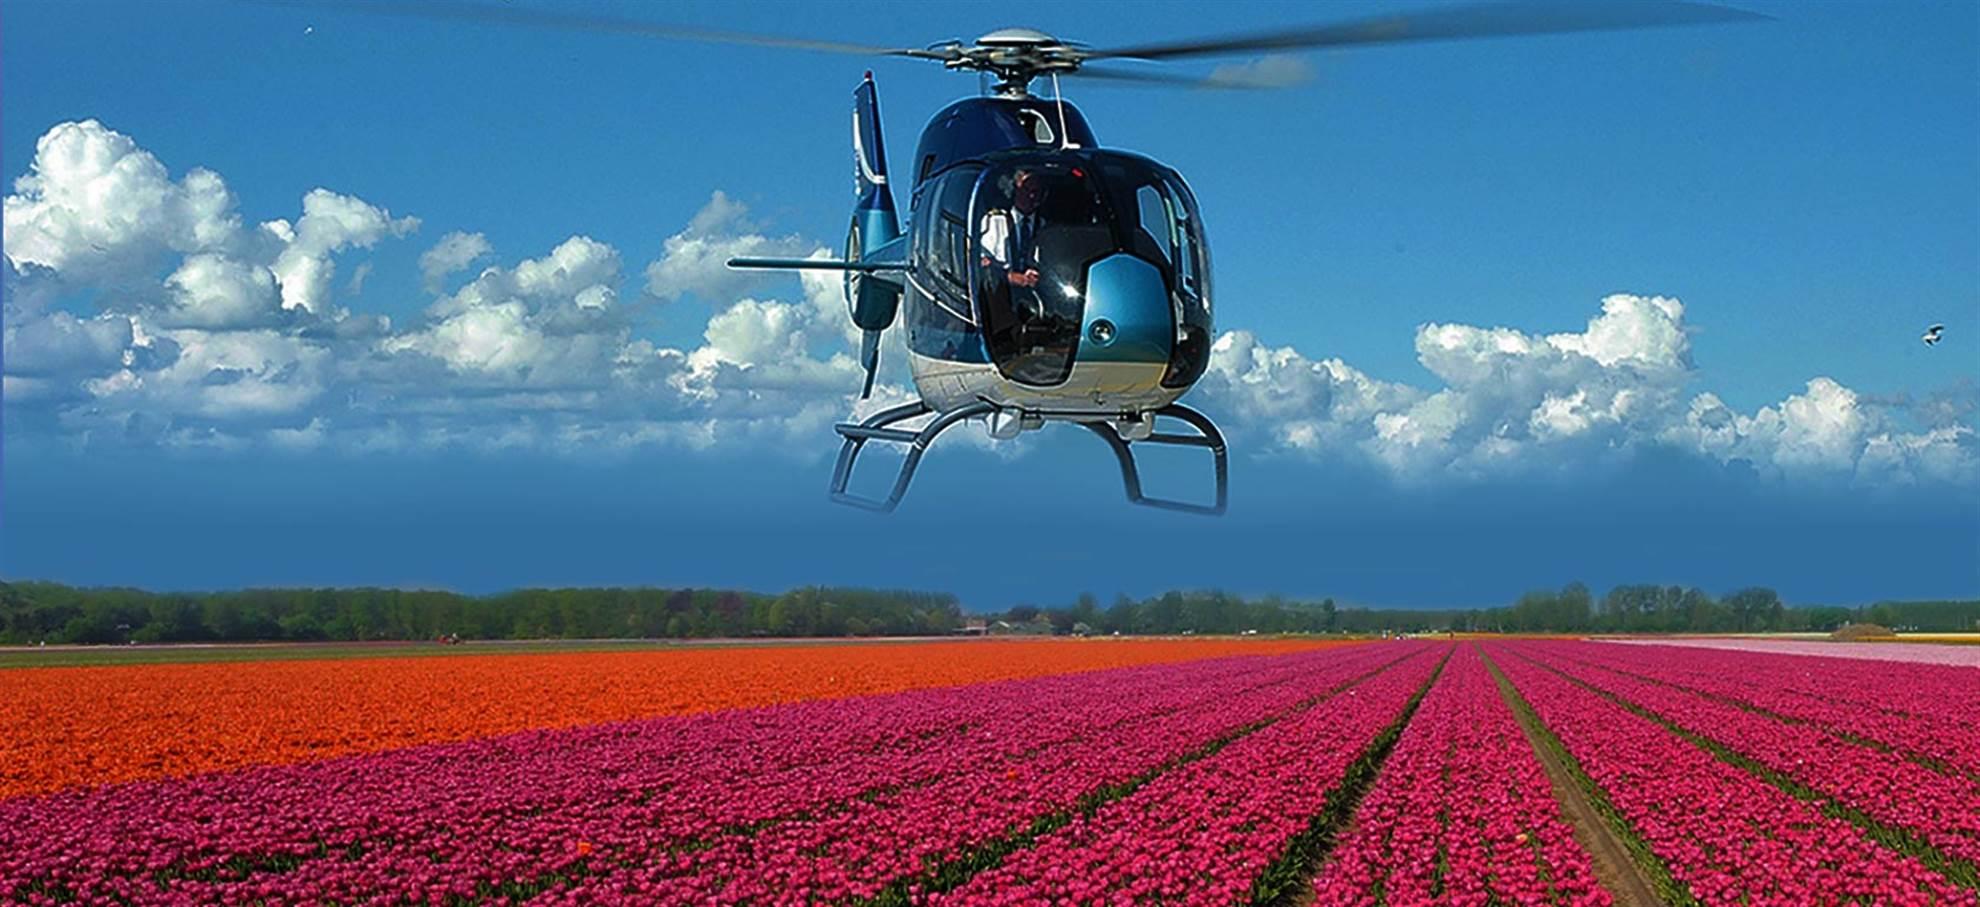 Tour de Helicóptero Keukenhof (incl. Entrada Keukenhof)